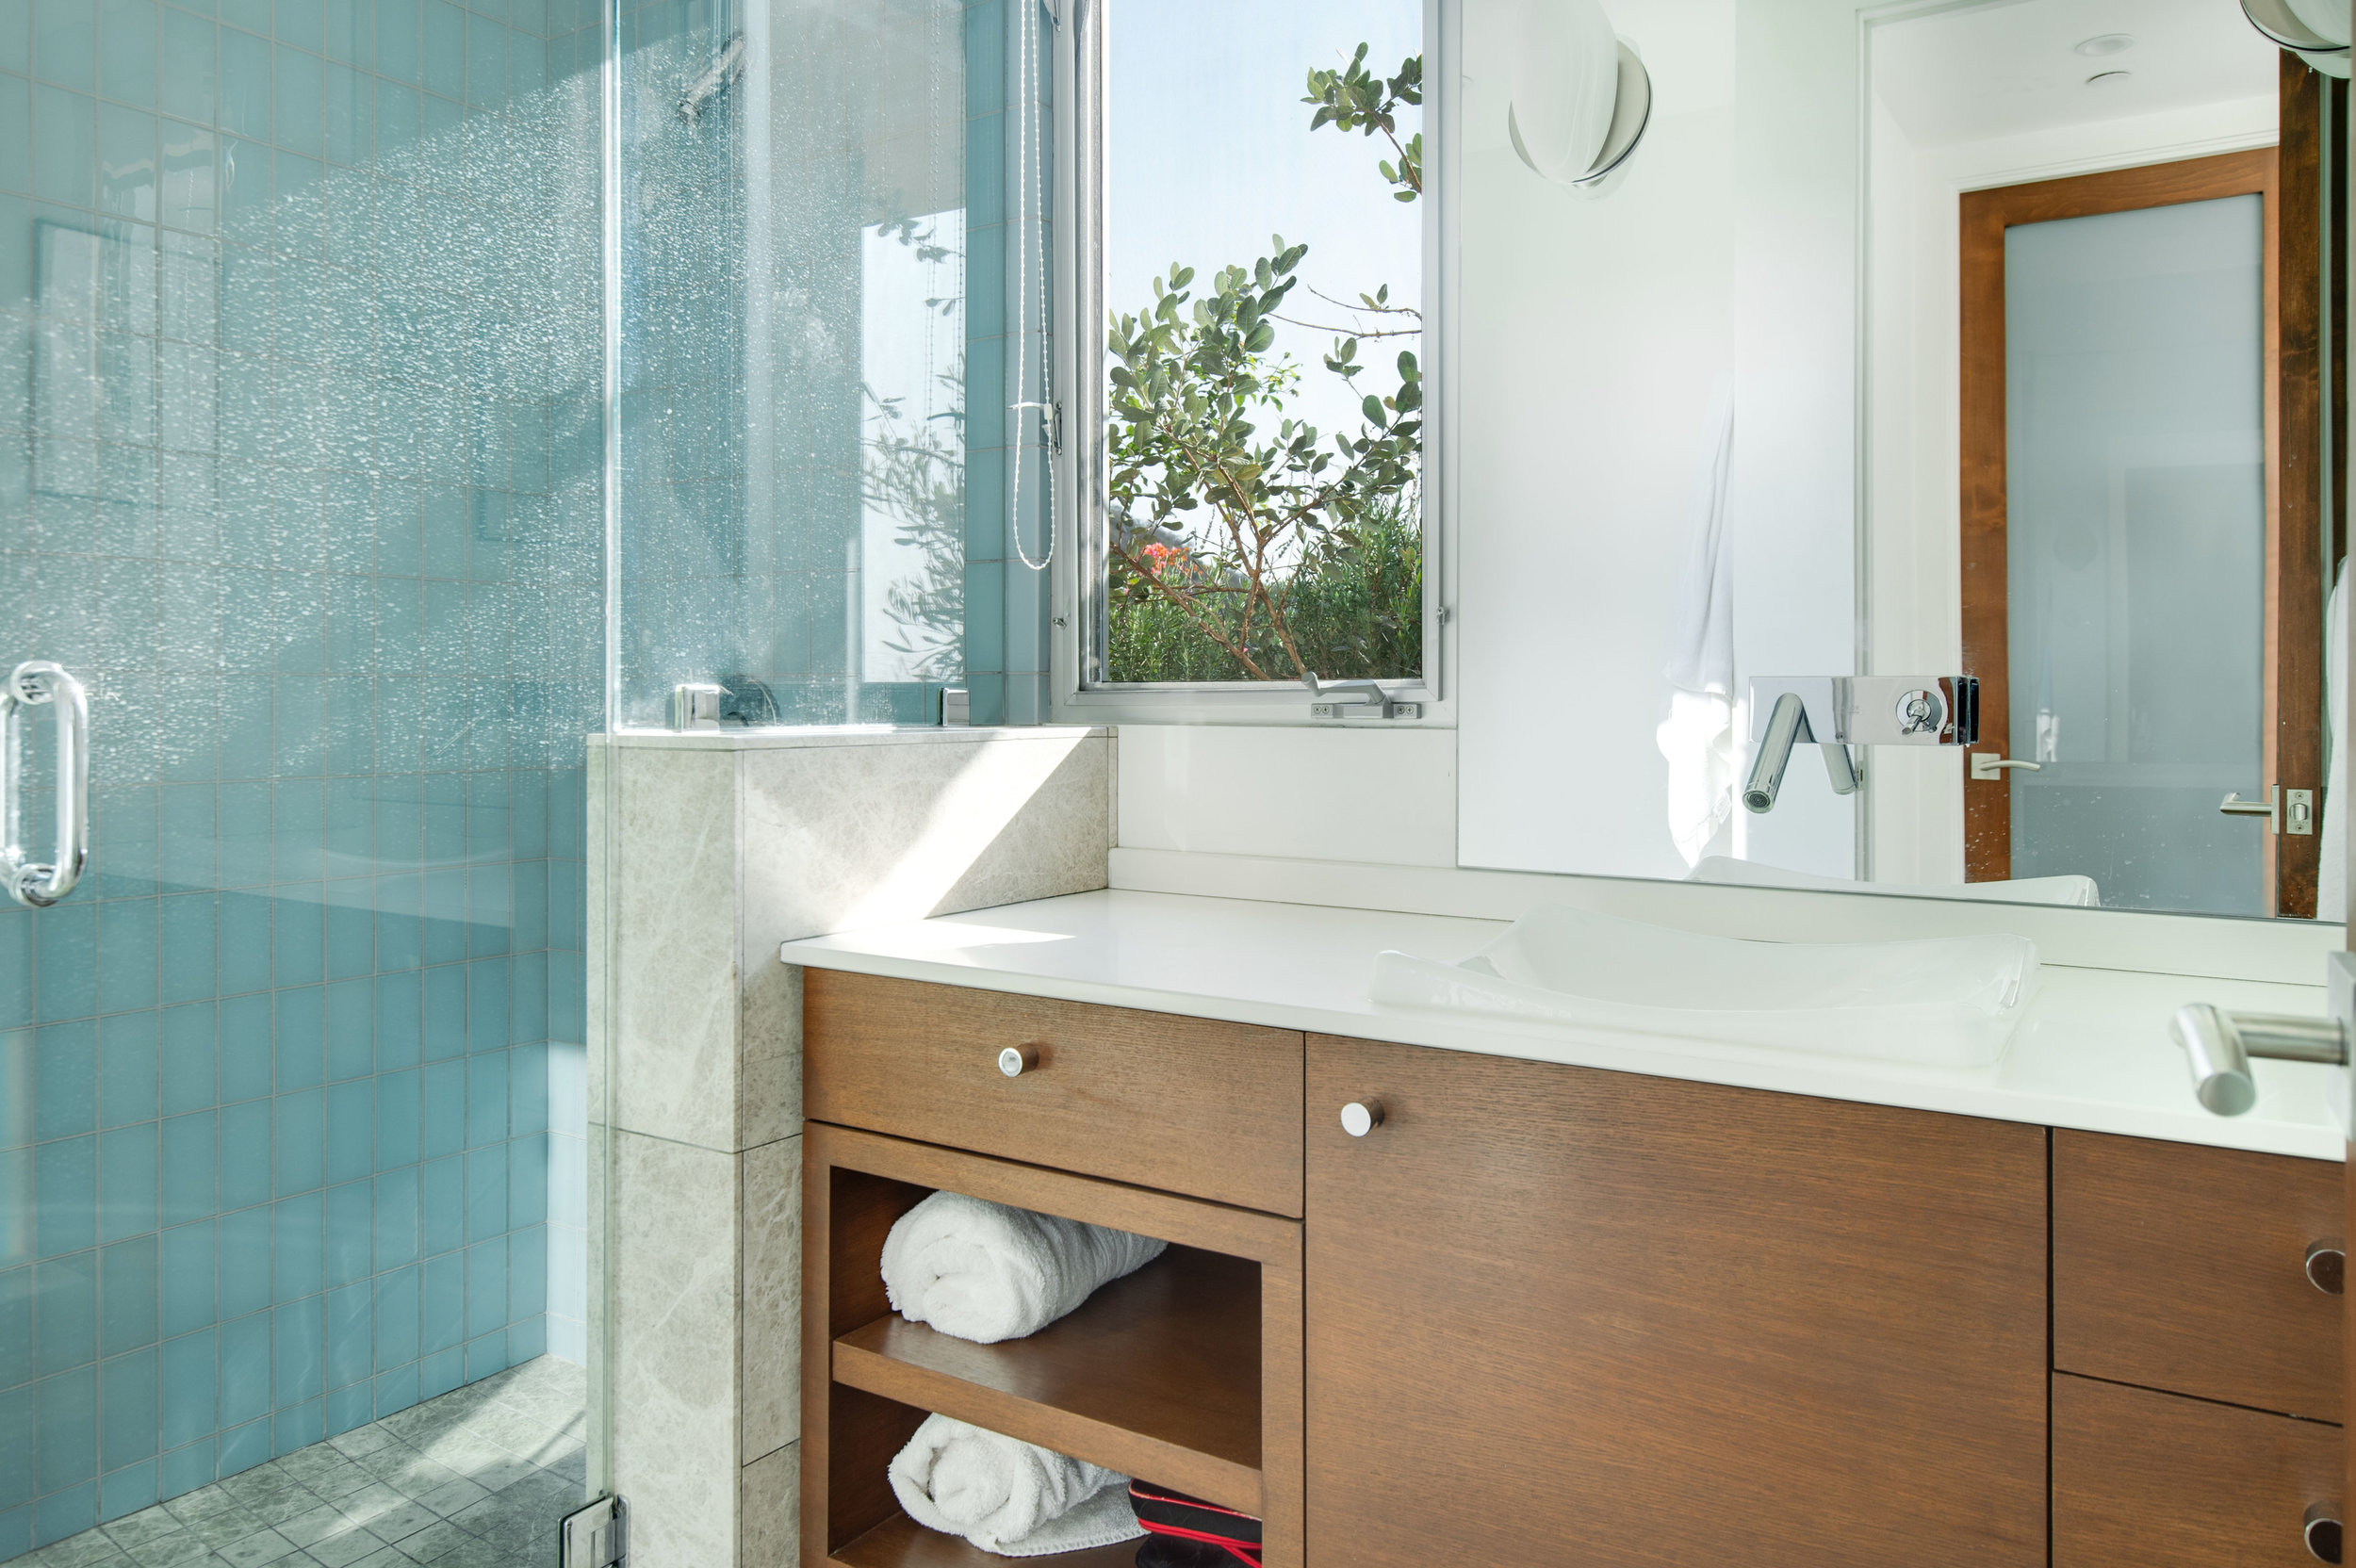 Copy of 012.1 Bathroom 20729 Eaglepass For Sale Lease The Malibu Life Team Luxury Real Estate.jpg